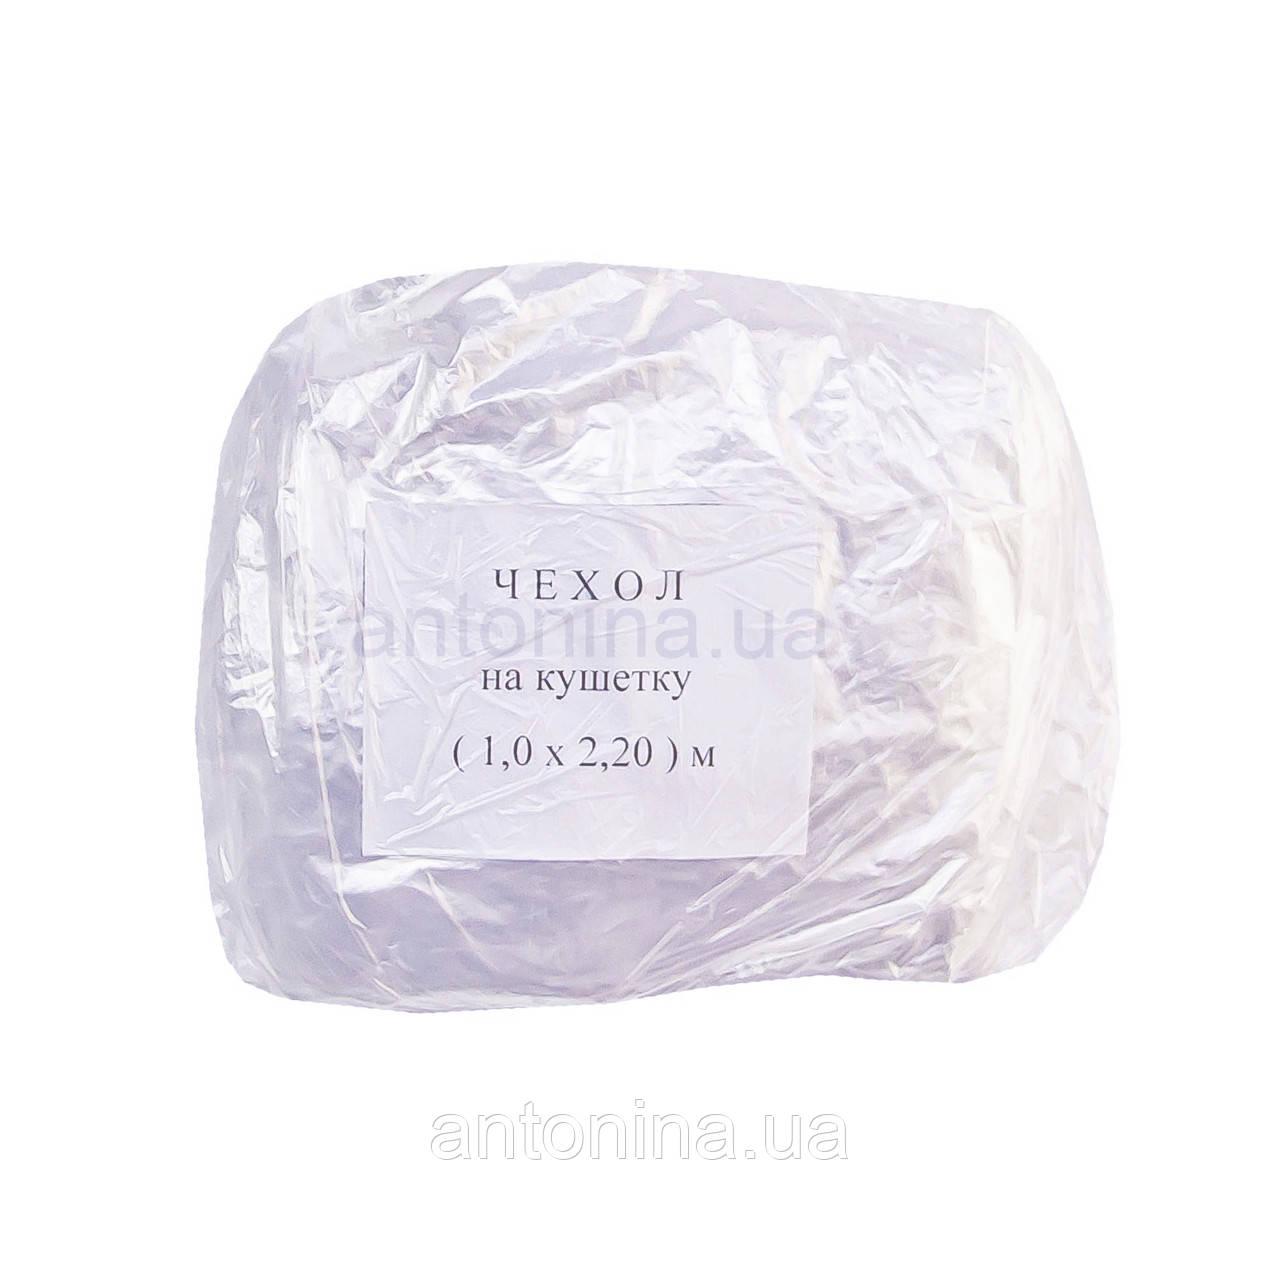 Чехол одноразовый на кушетку 1,0х2,2м, полиэтилен